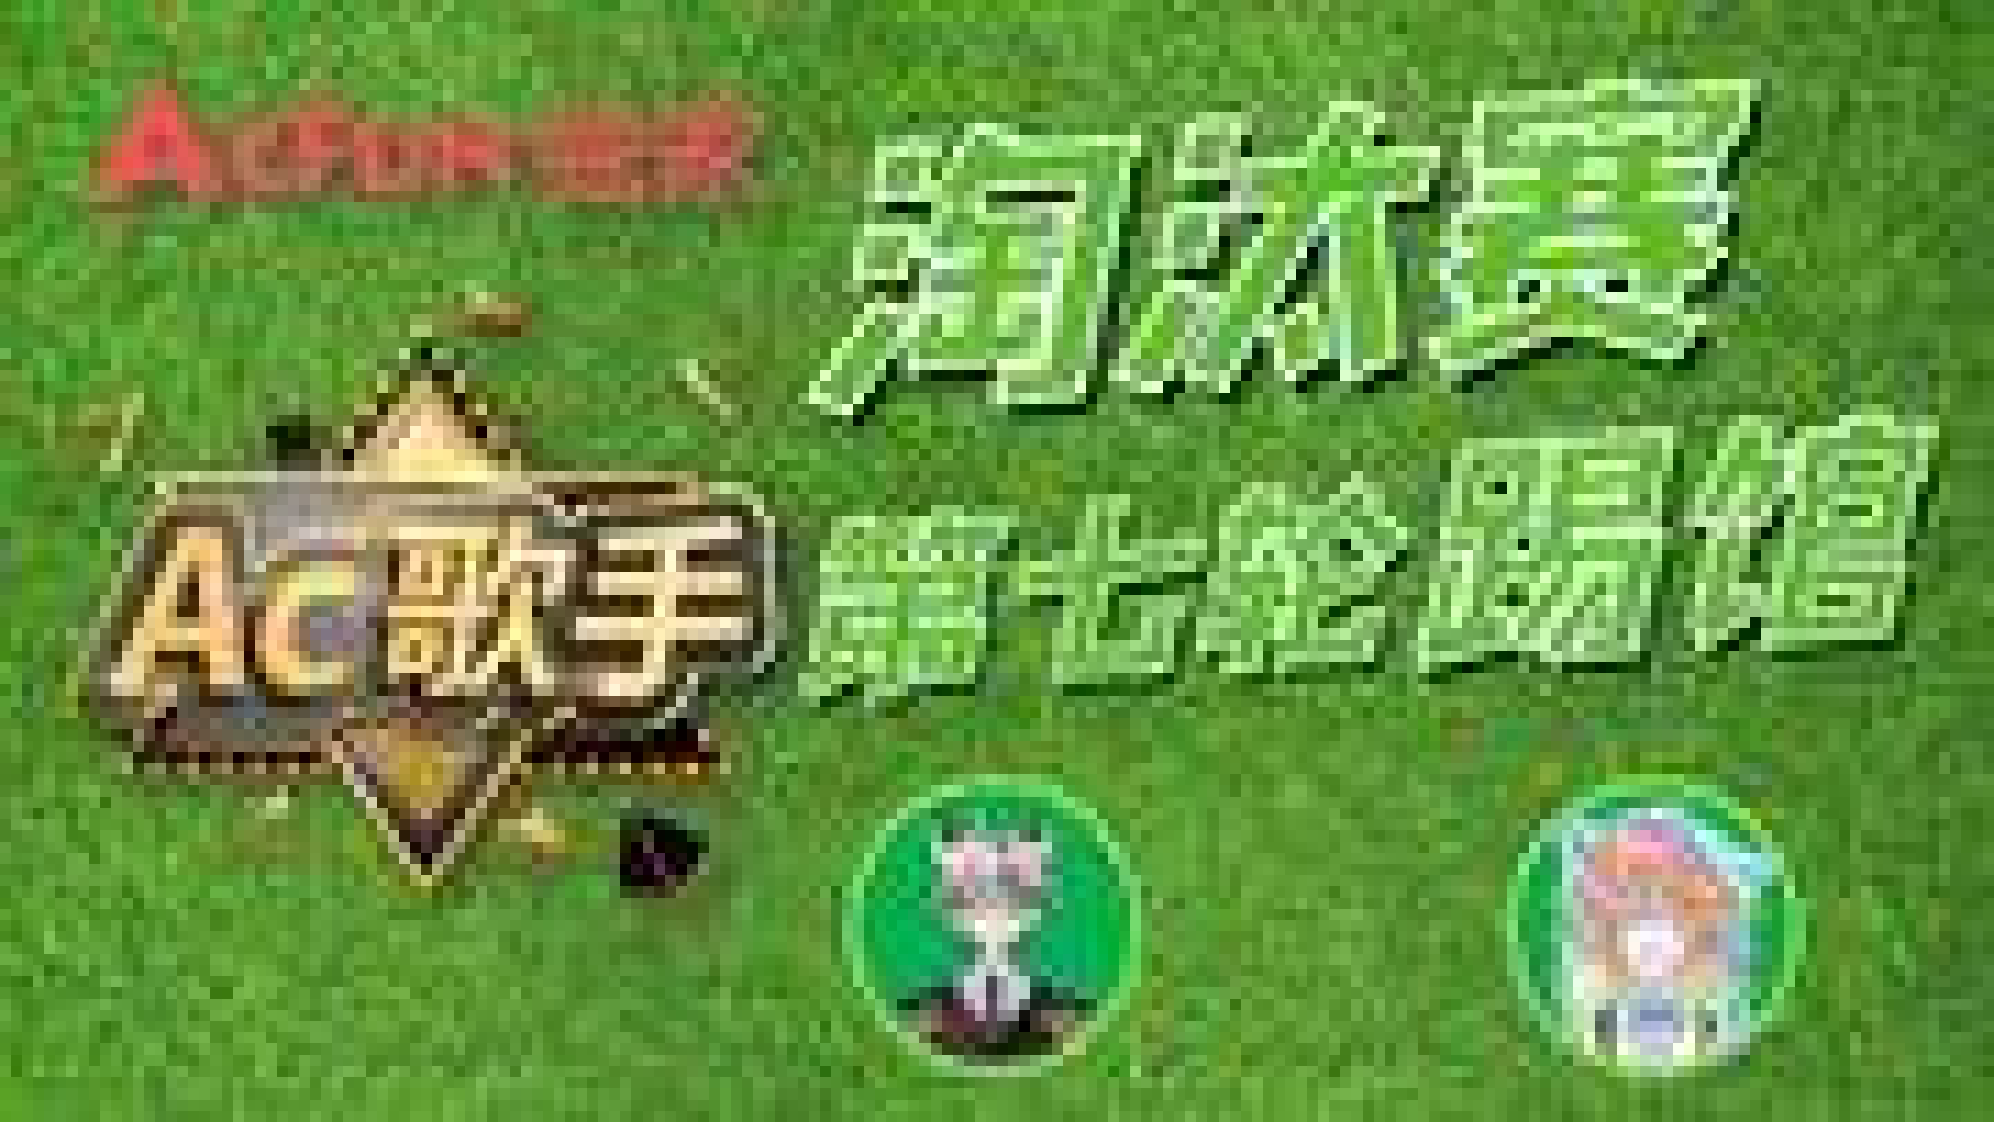 "《AC歌手》第七轮踢馆赛""绿"":要想生活过得去,头上总得带点绿!"